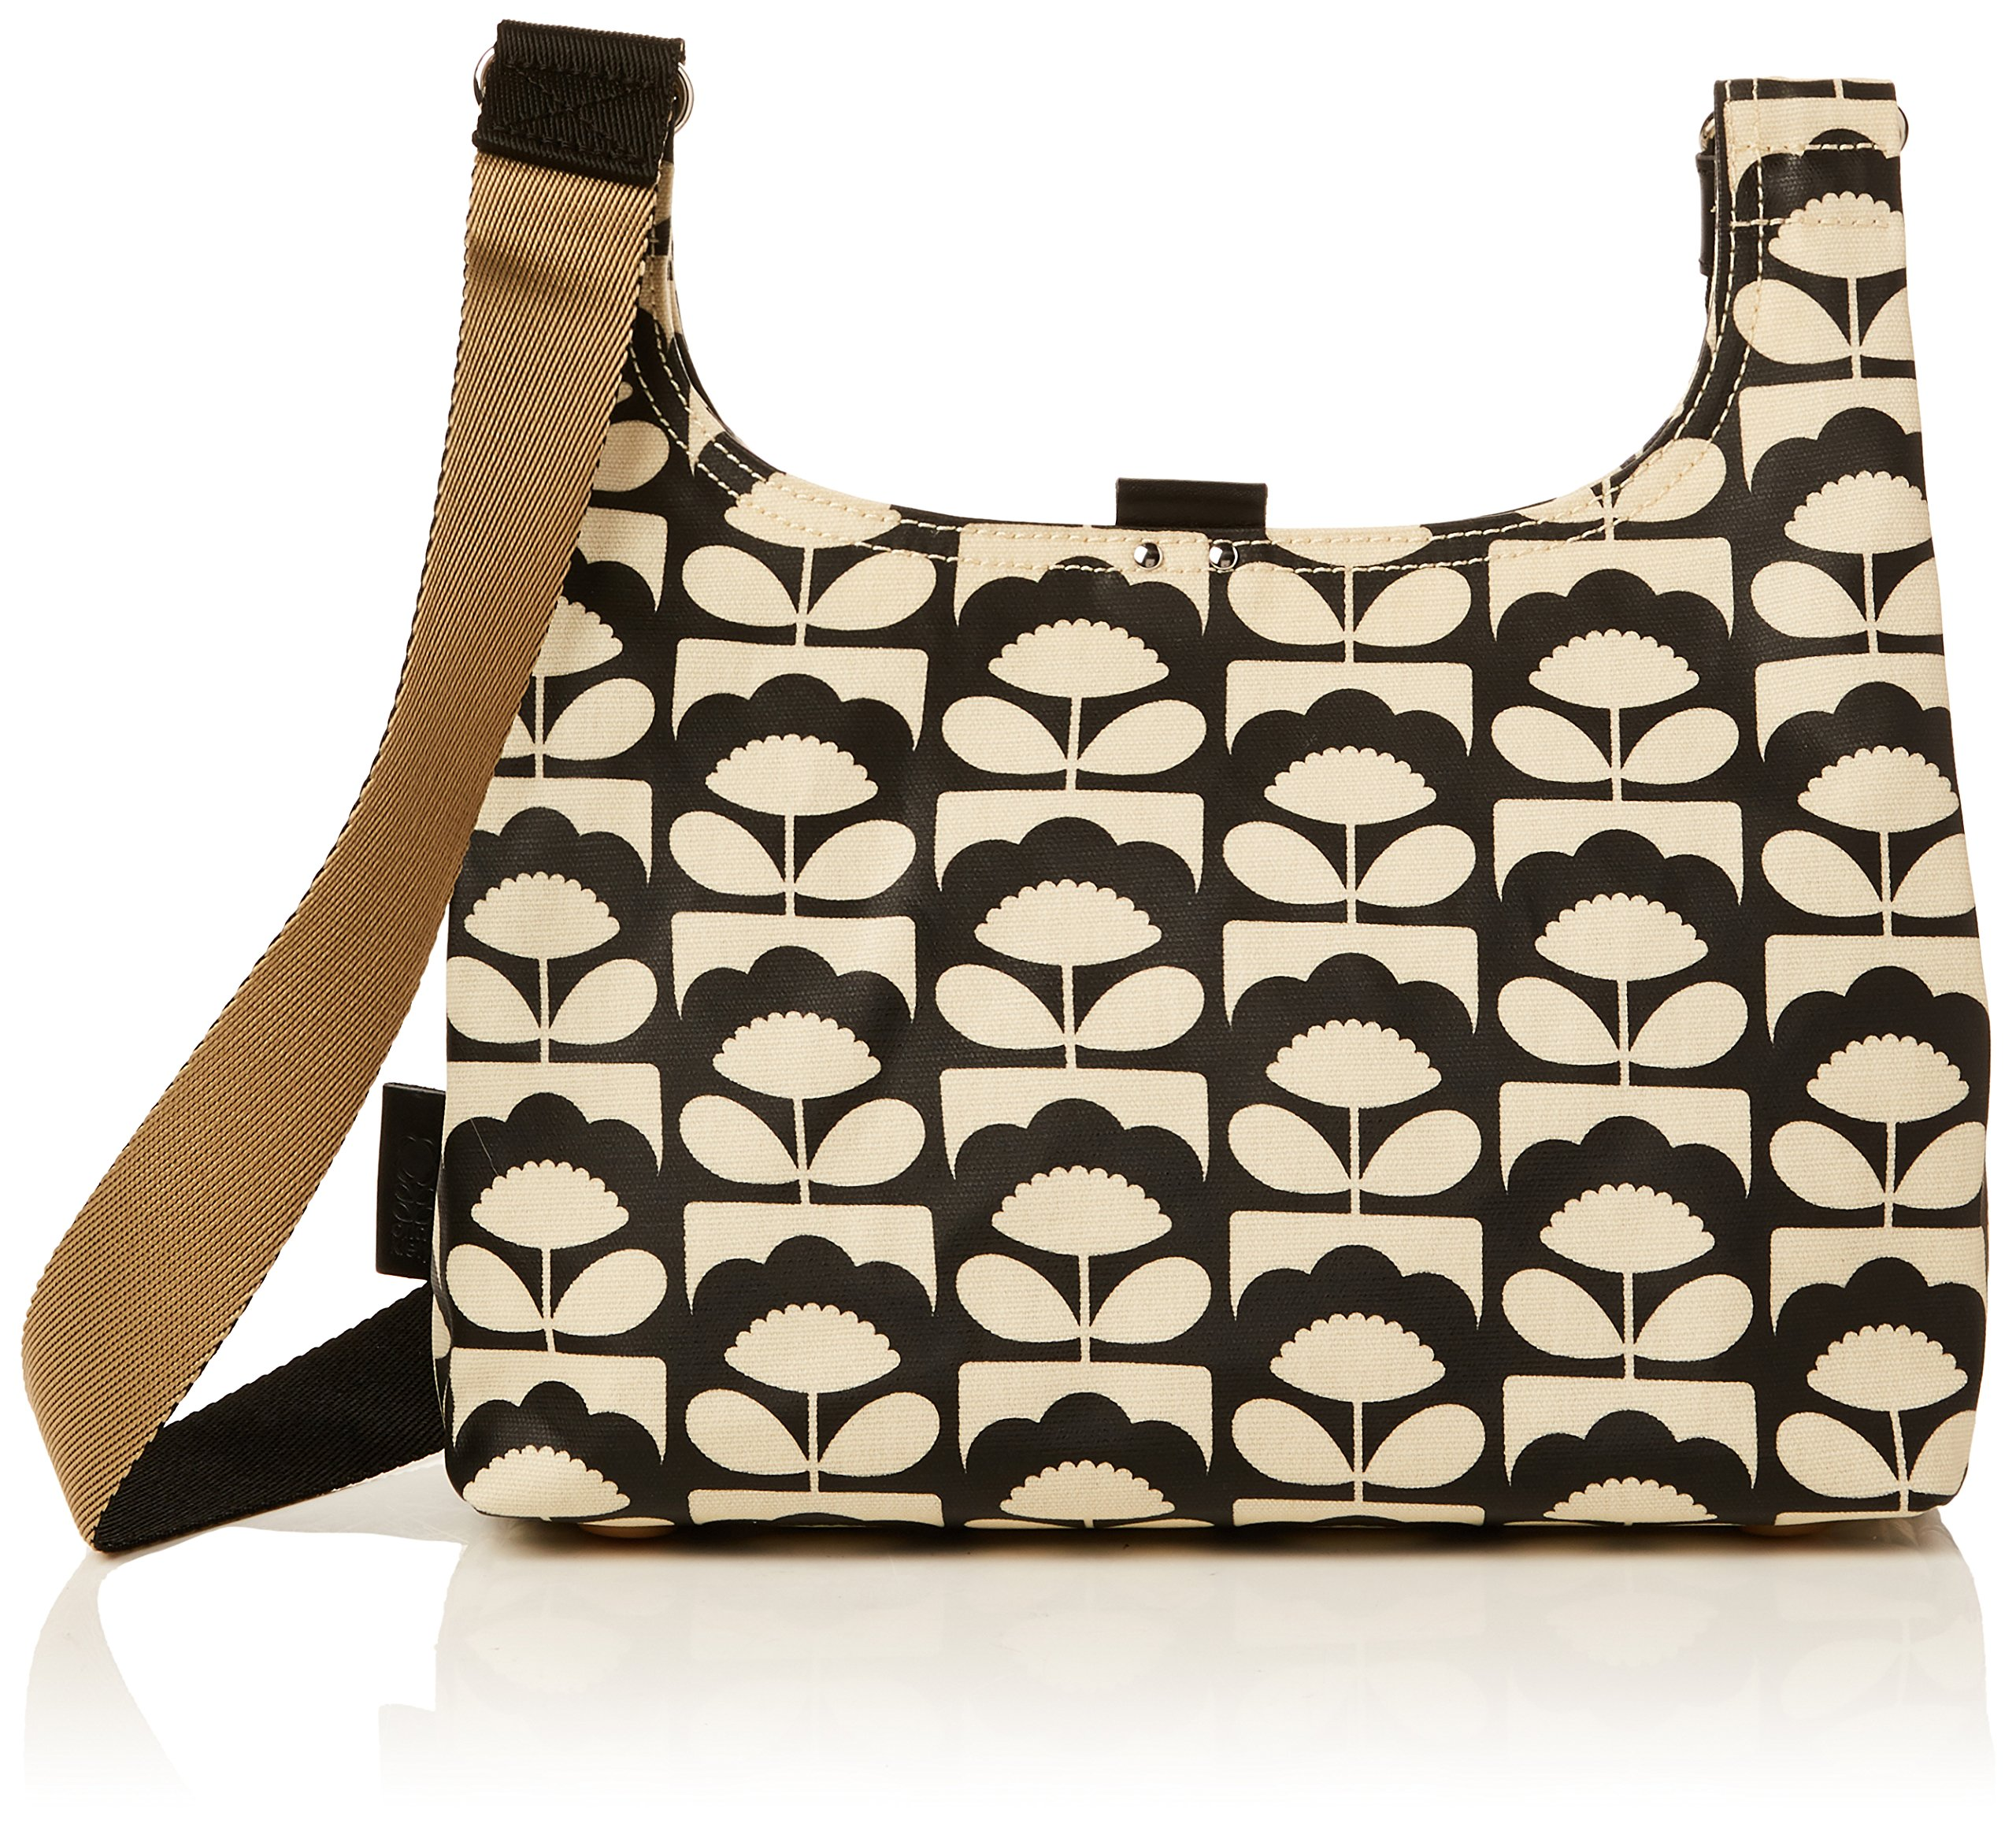 Orla Kiely Spring Bloom Mini Sling Bag, Charcoal